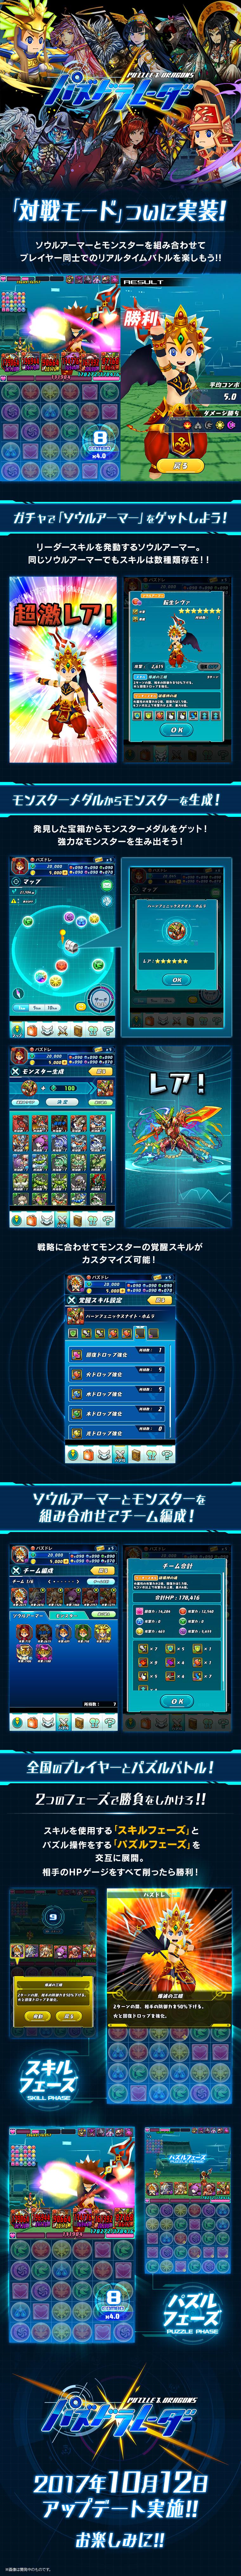 padr_battle.jpg